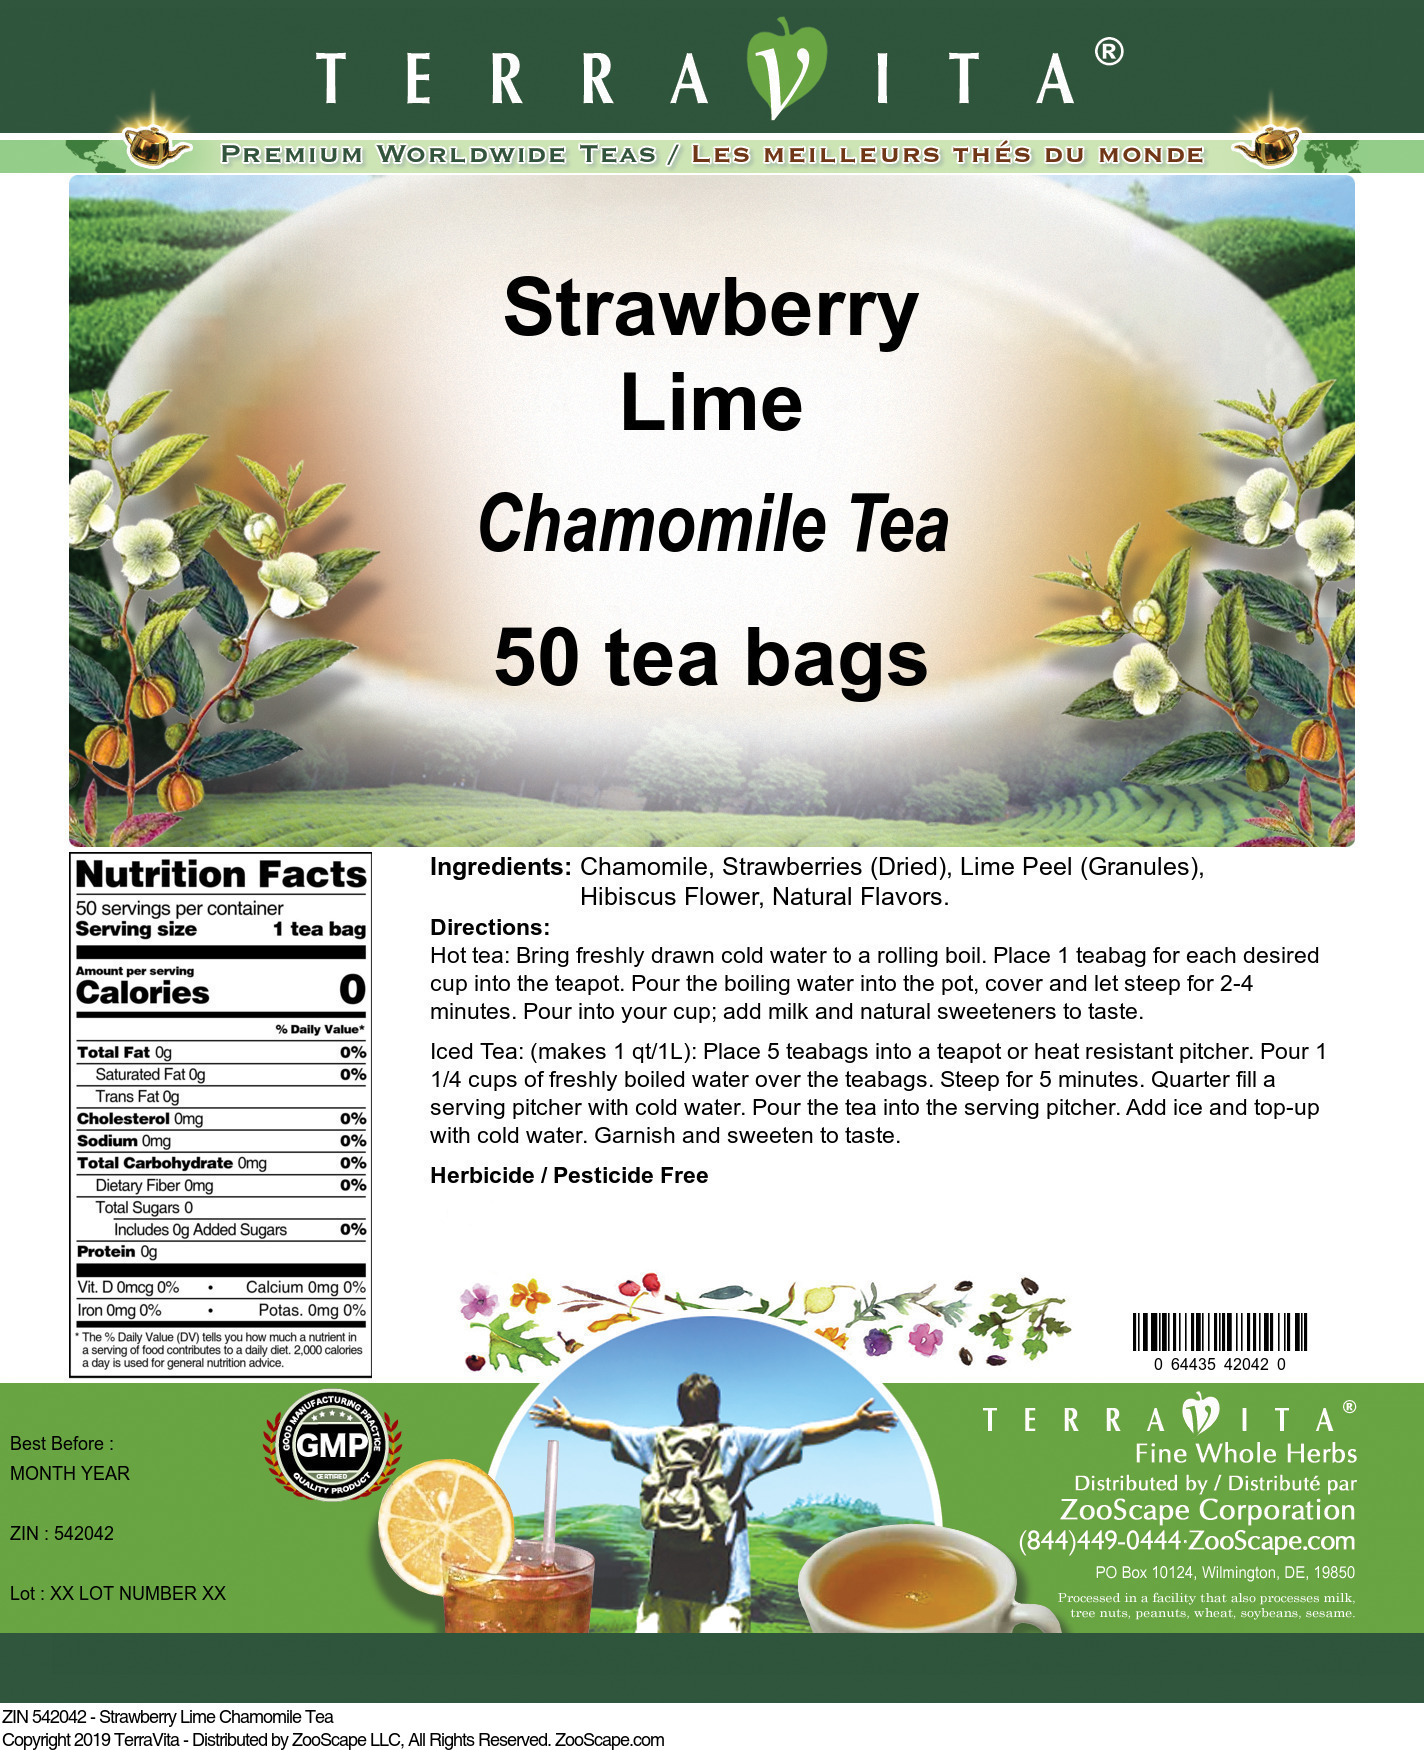 Strawberry Lime Chamomile Tea